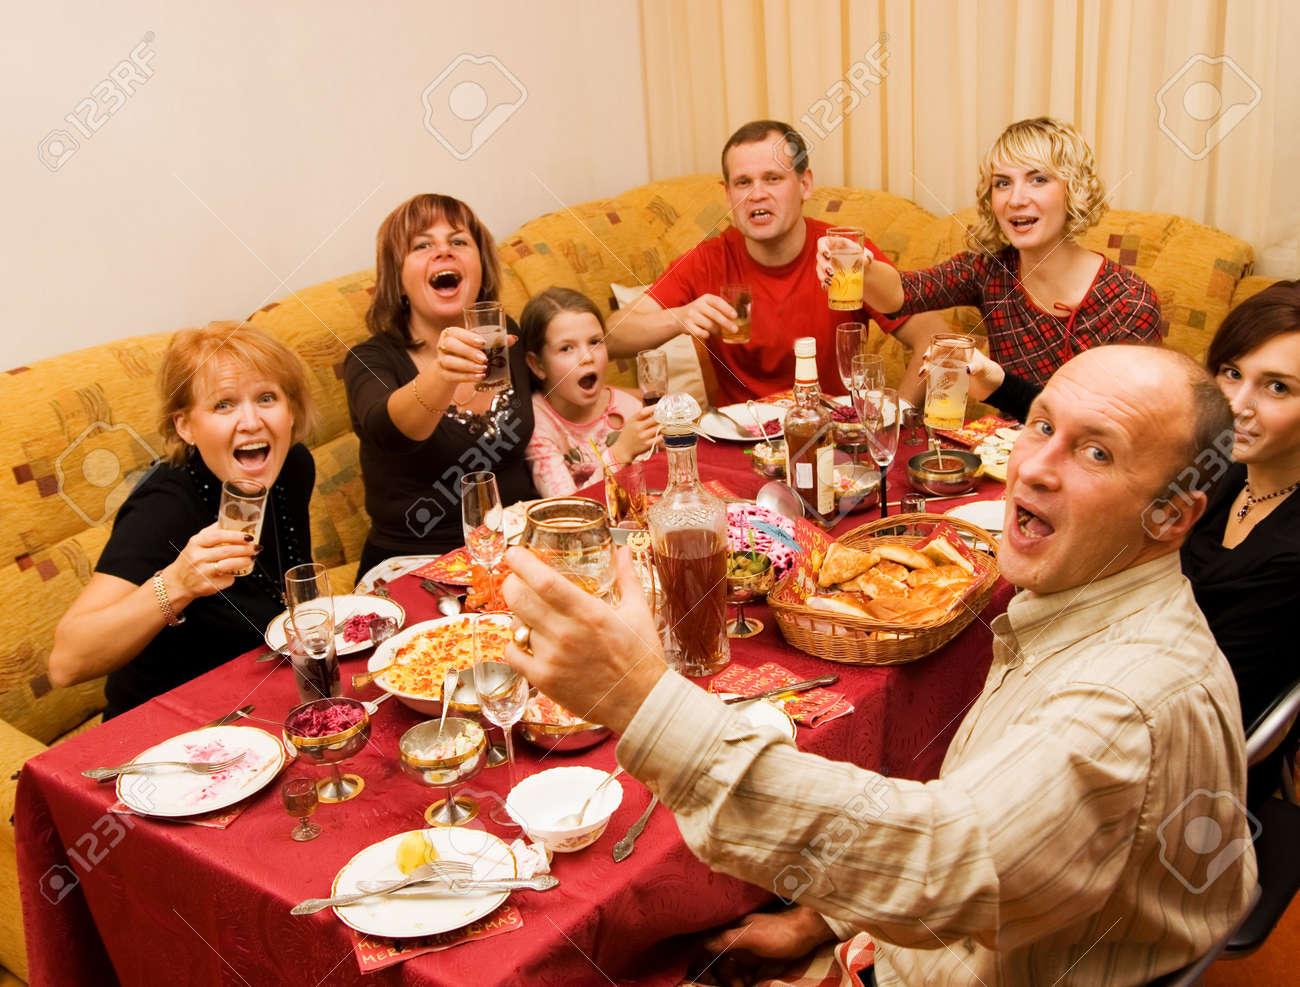 Какой по счет тост пьют за родителей